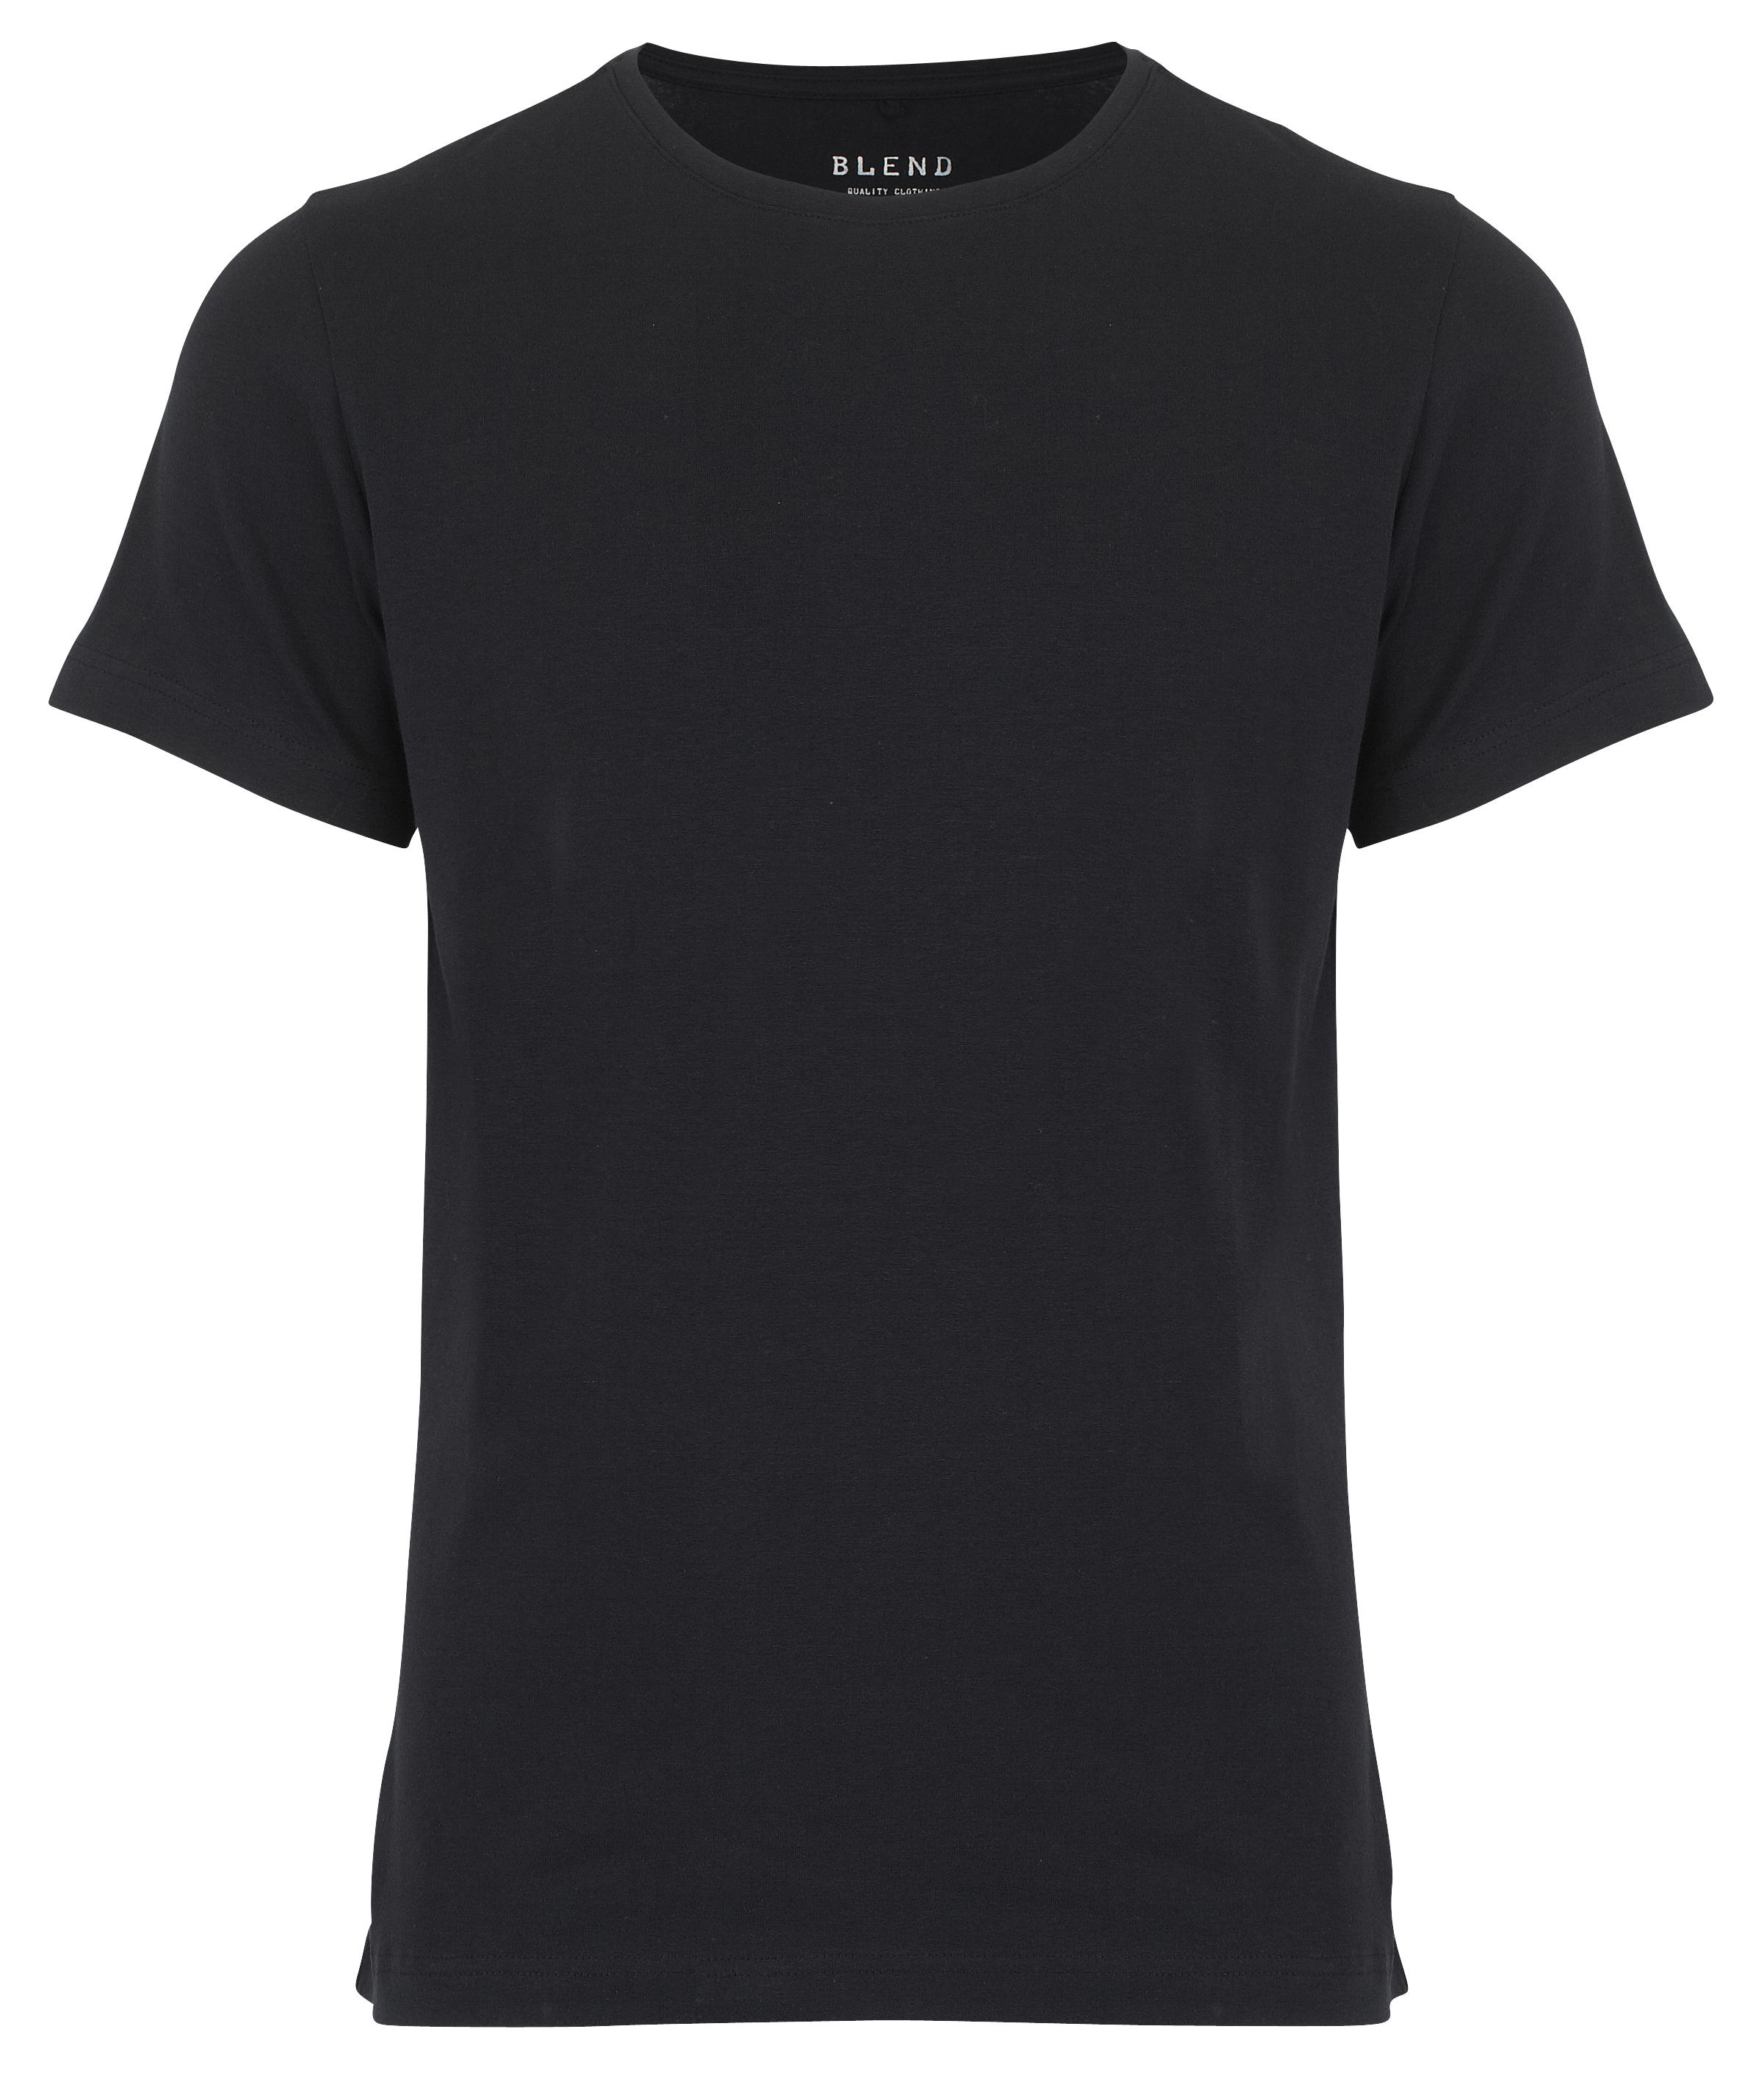 Blend He Herre Kortærmet T-shirt - Sort